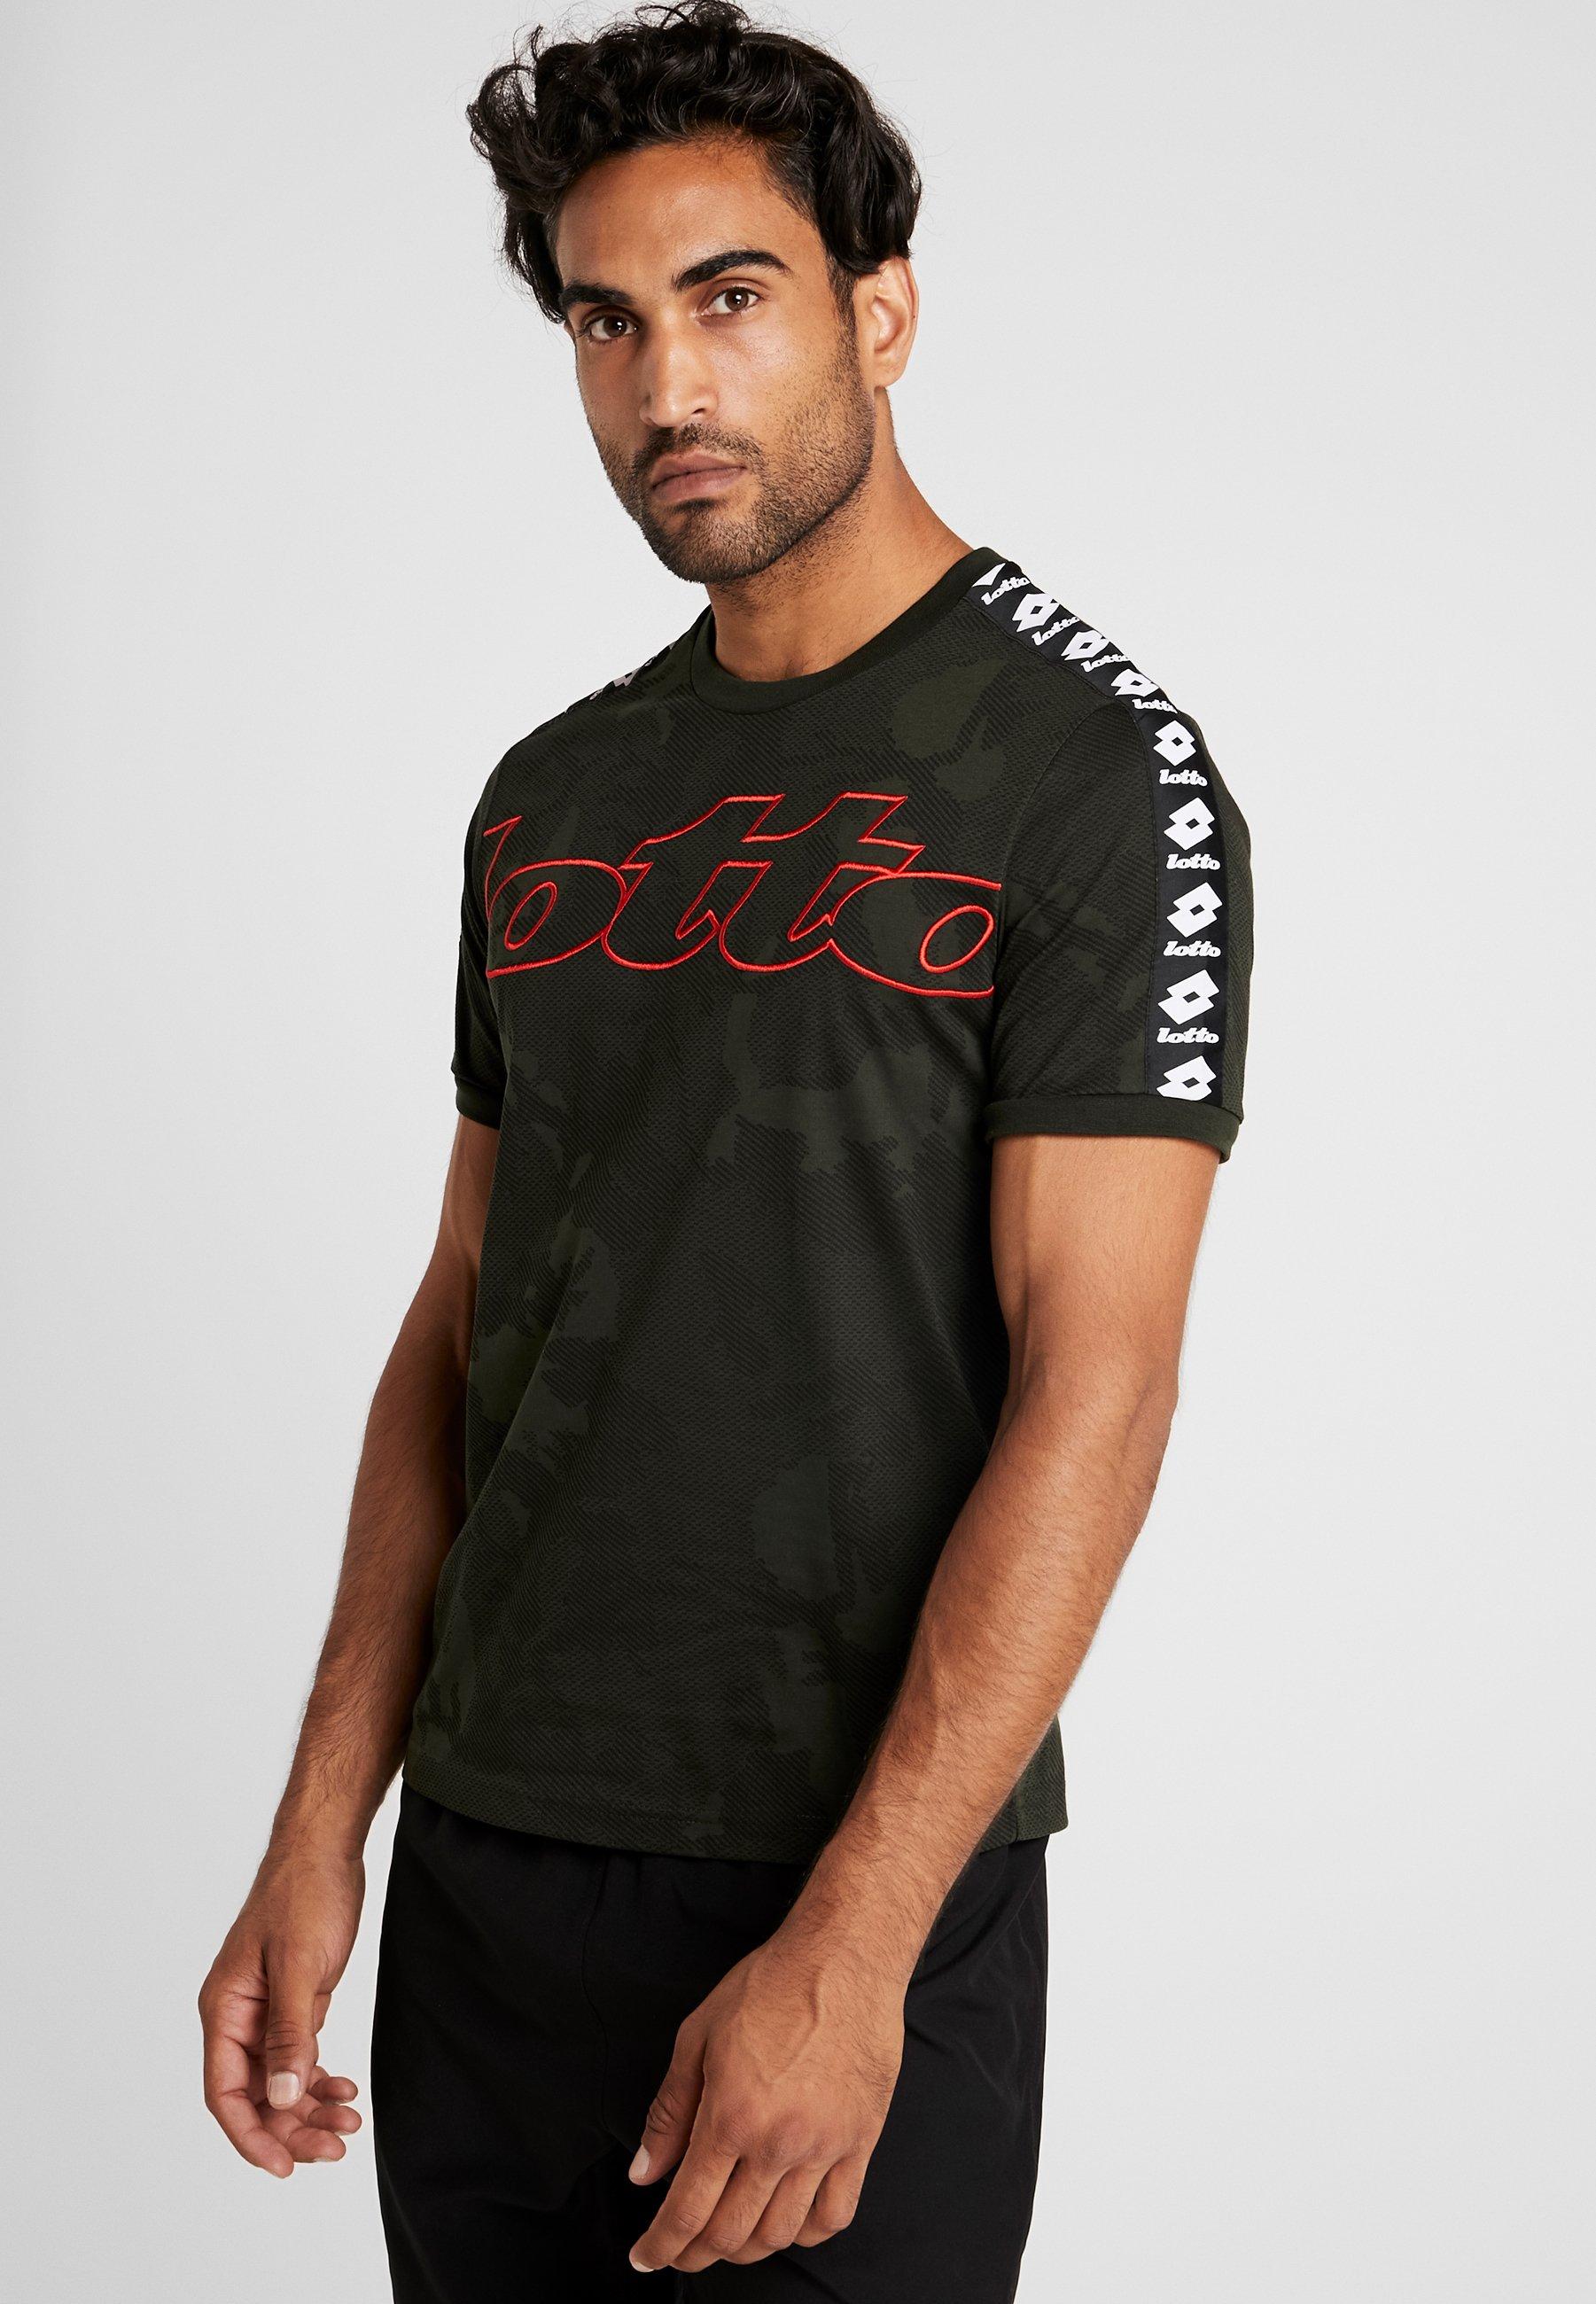 Con Stampa Lotto TeeT Resin shirt Athletica Green vnNOm08w